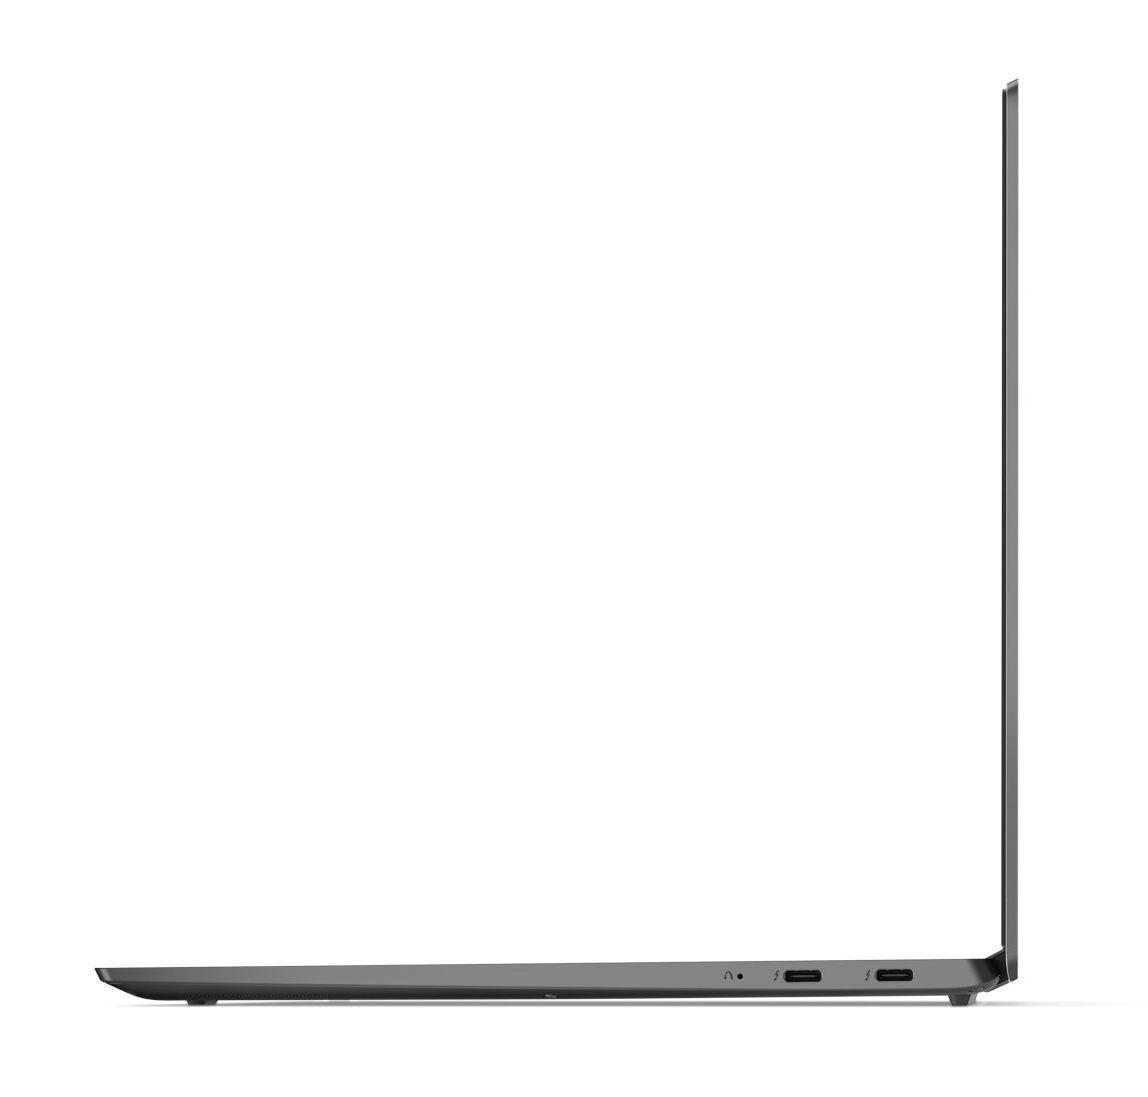 Ordinateur portable Lenovo Yoga S730-13IWL (81J0001RFR) Gris - photo 6